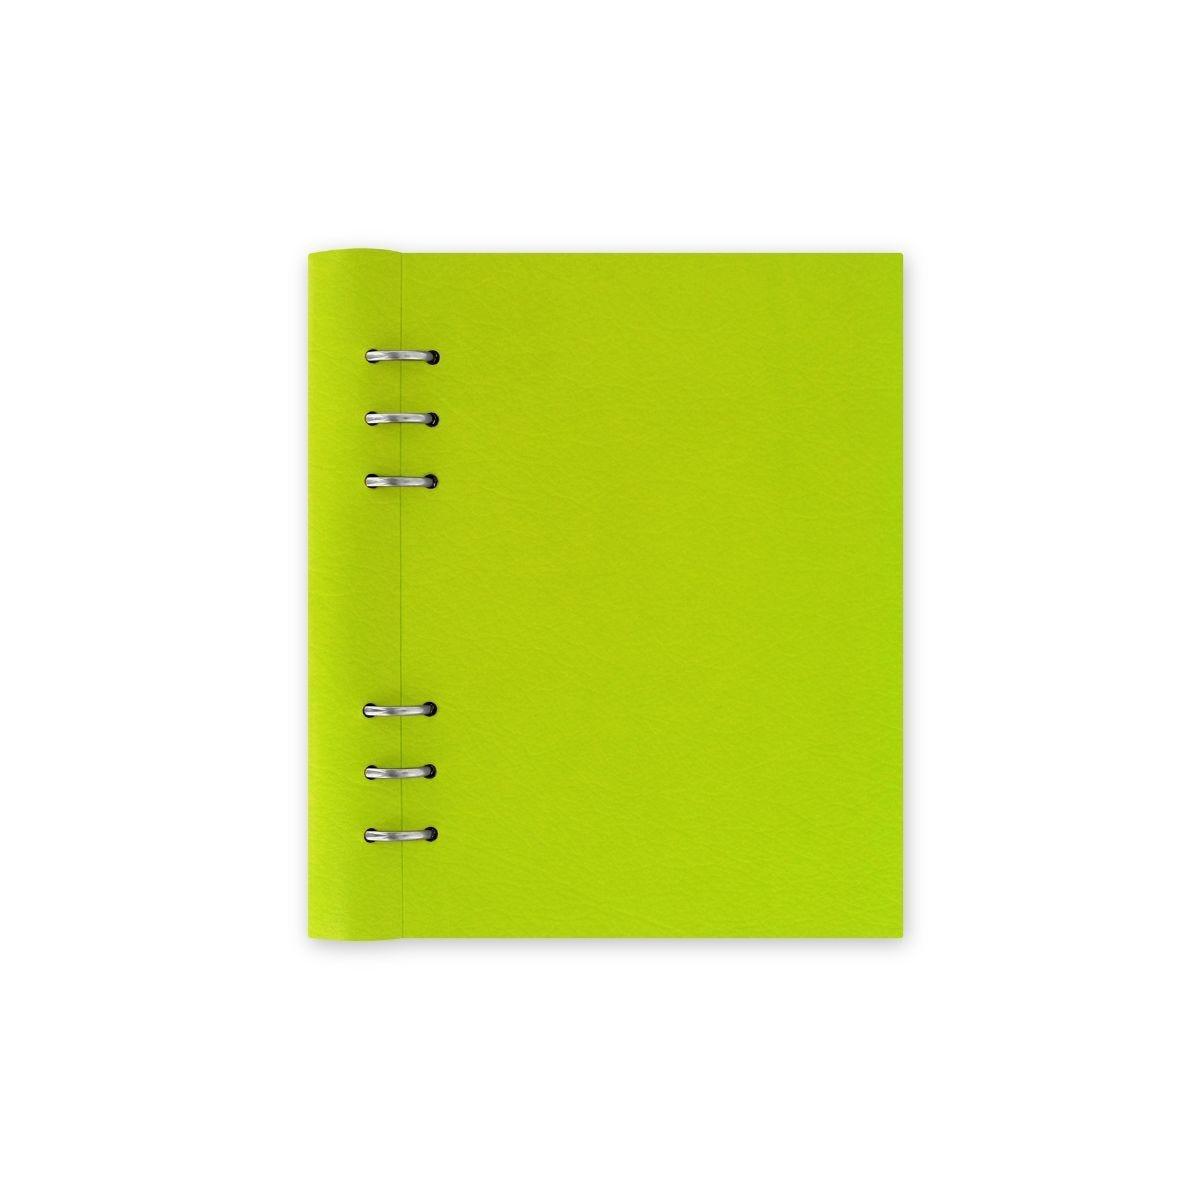 Filofax Refillable Clipbook Planner A5 Pear